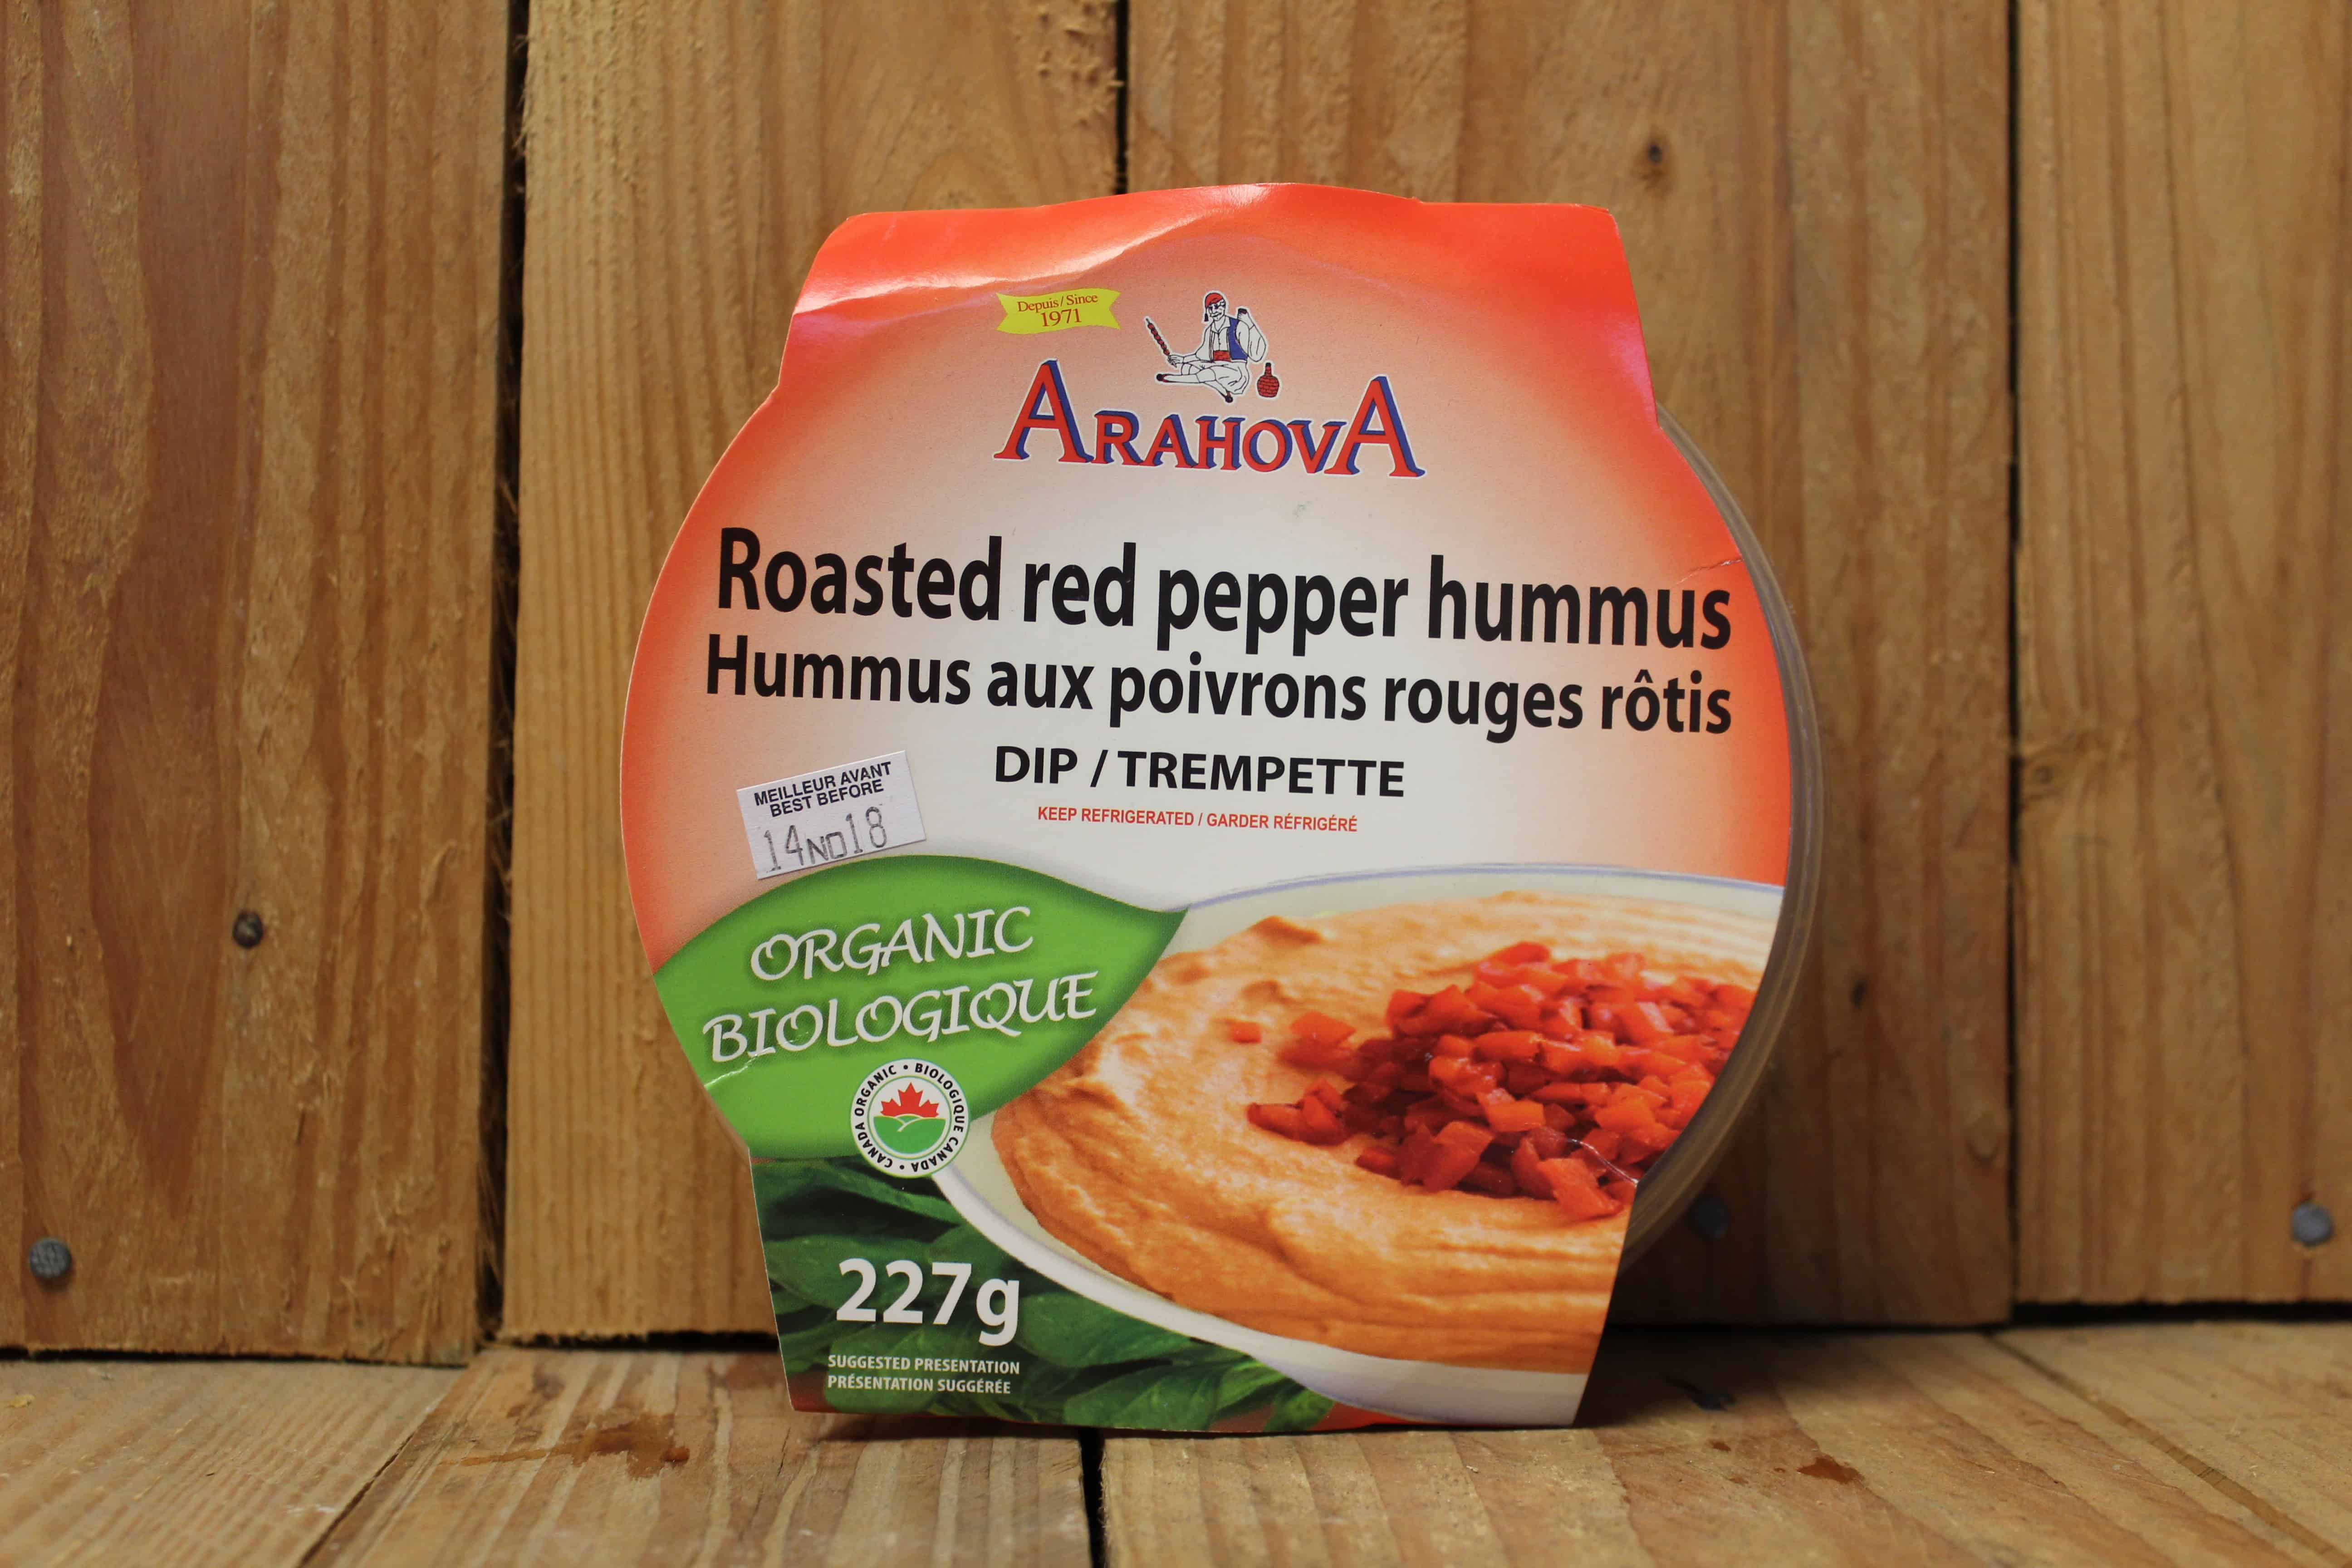 Arahova – Hummus, Red Pepper (227g)